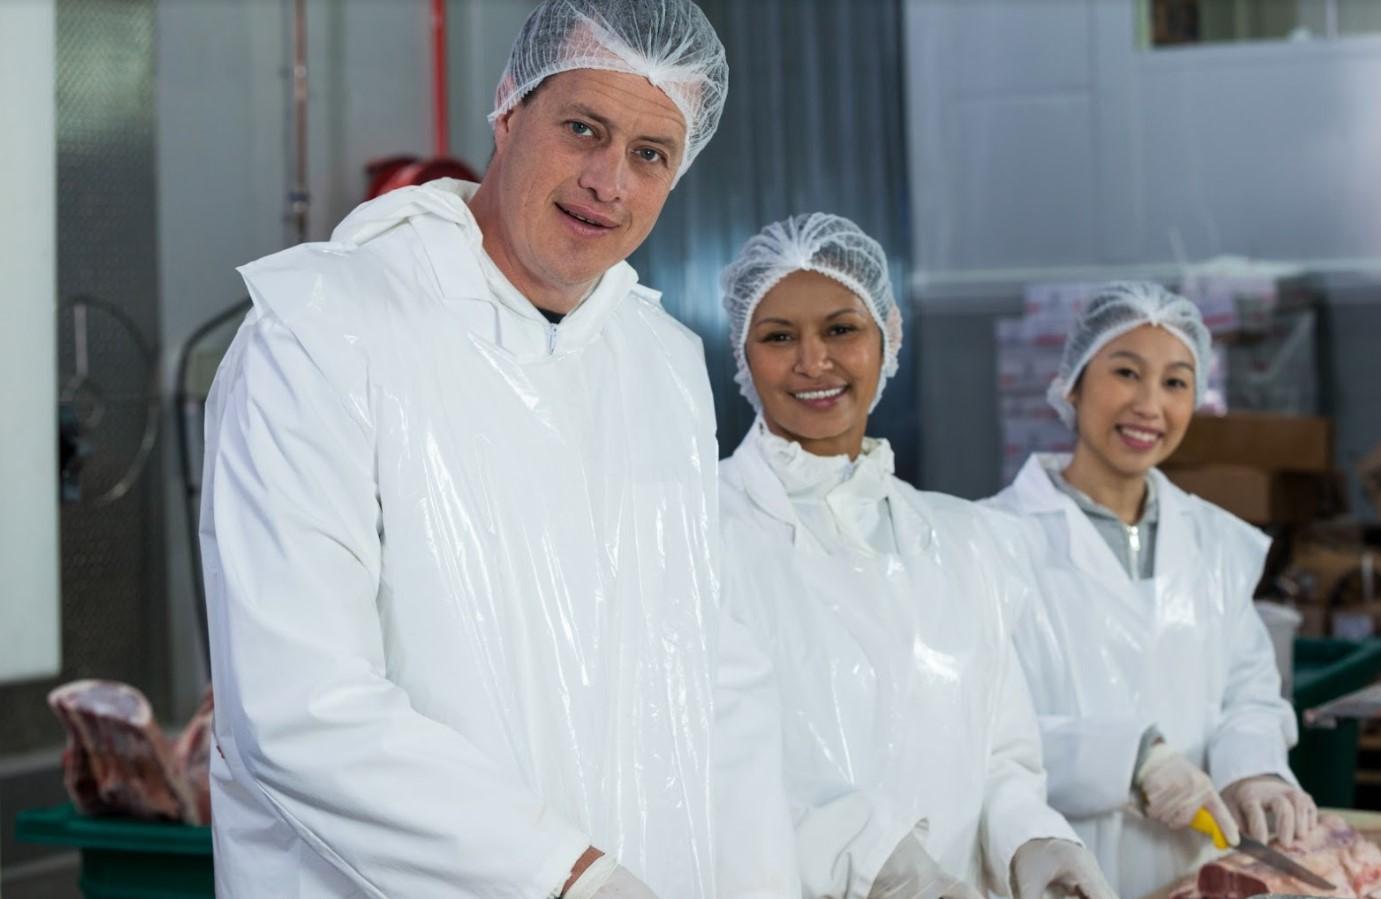 Meat factory worker